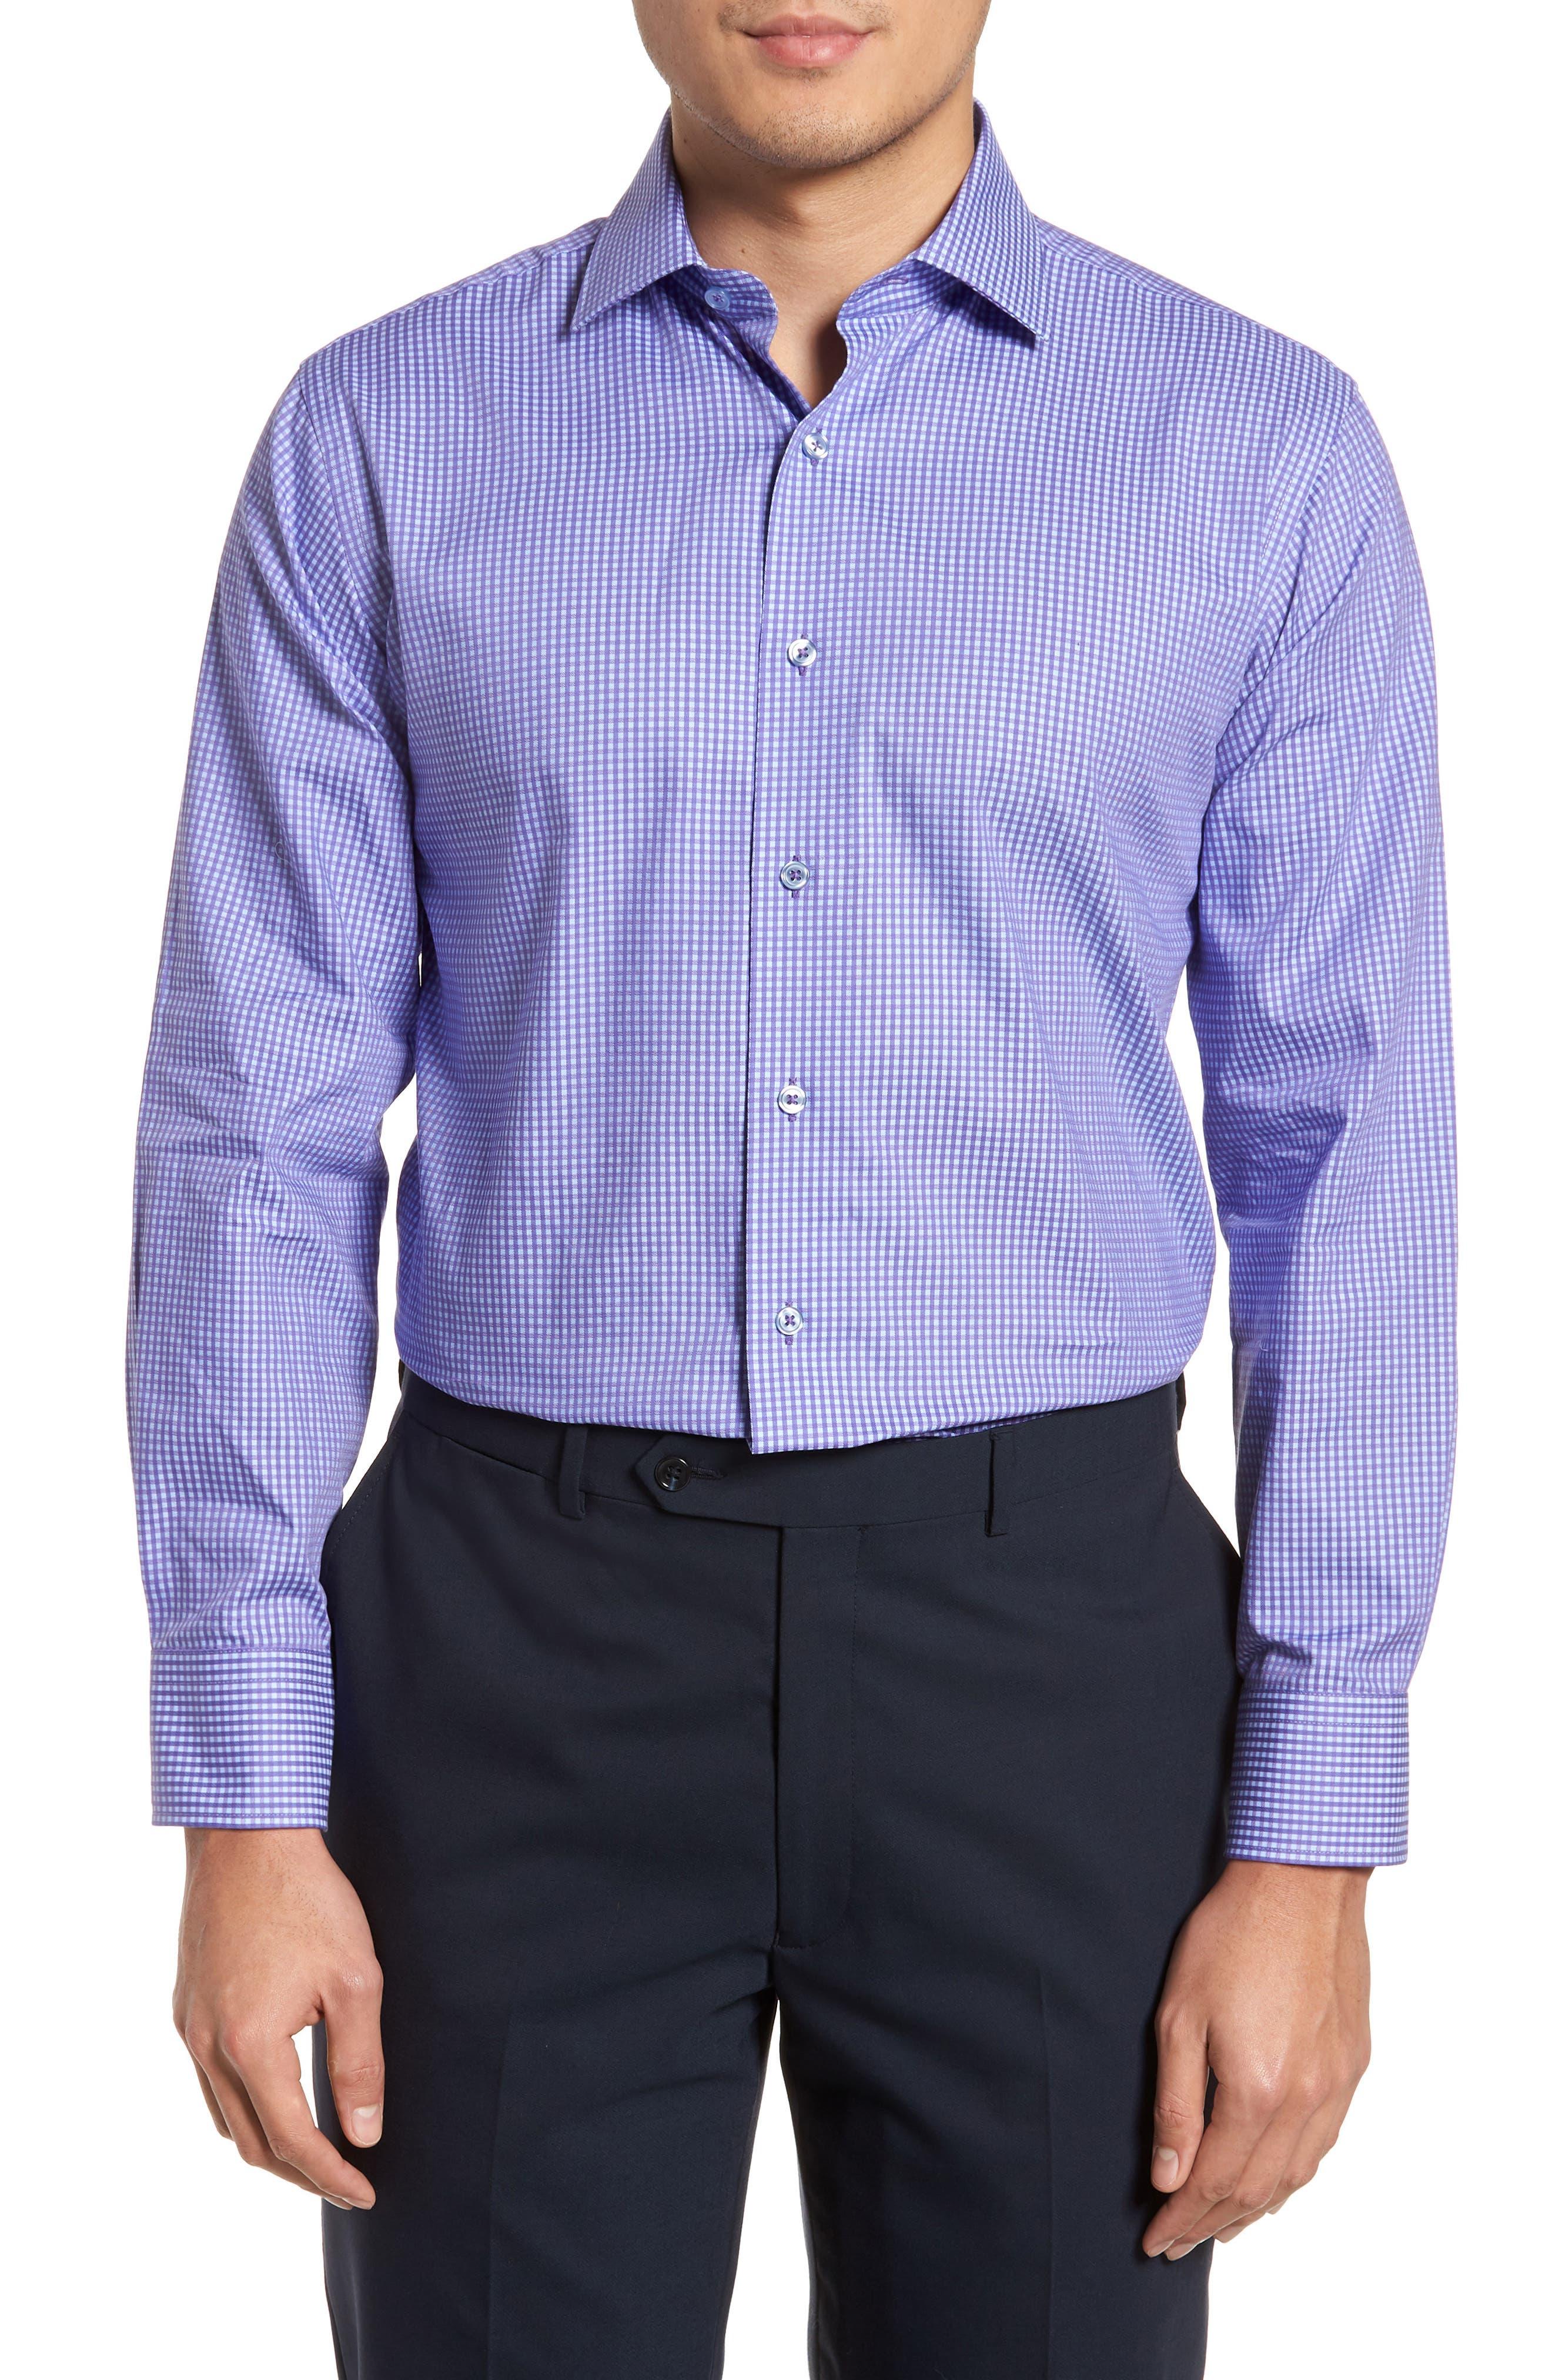 LORENZO UOMO Trim Fit Mini Check Dress Shirt, Main, color, 510